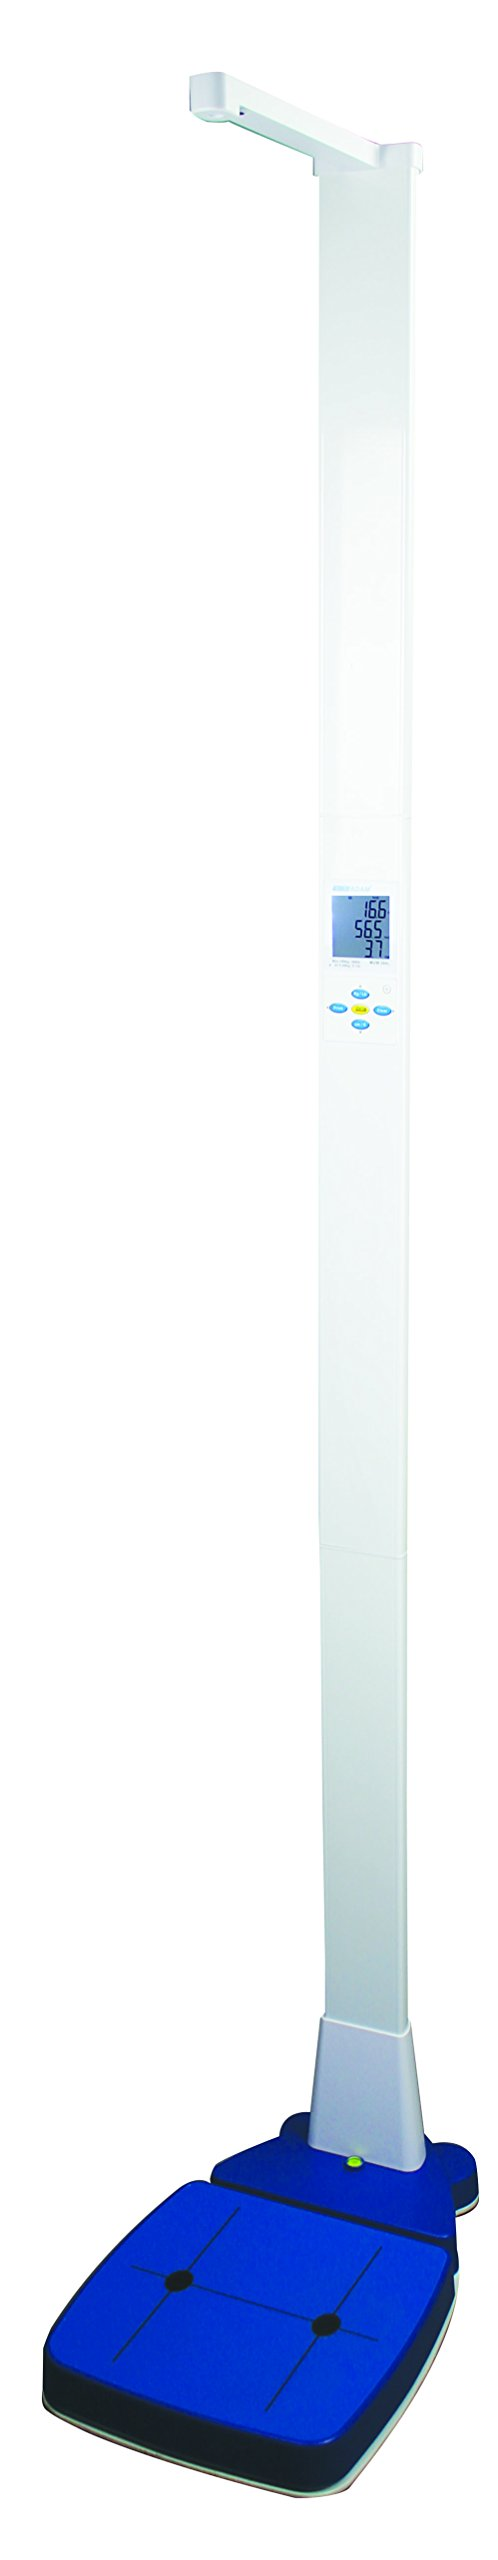 Adam Equipment MUW 300L Ultrasonic Height and Digital Health Scale, 300kg Capacity, 50g Readability